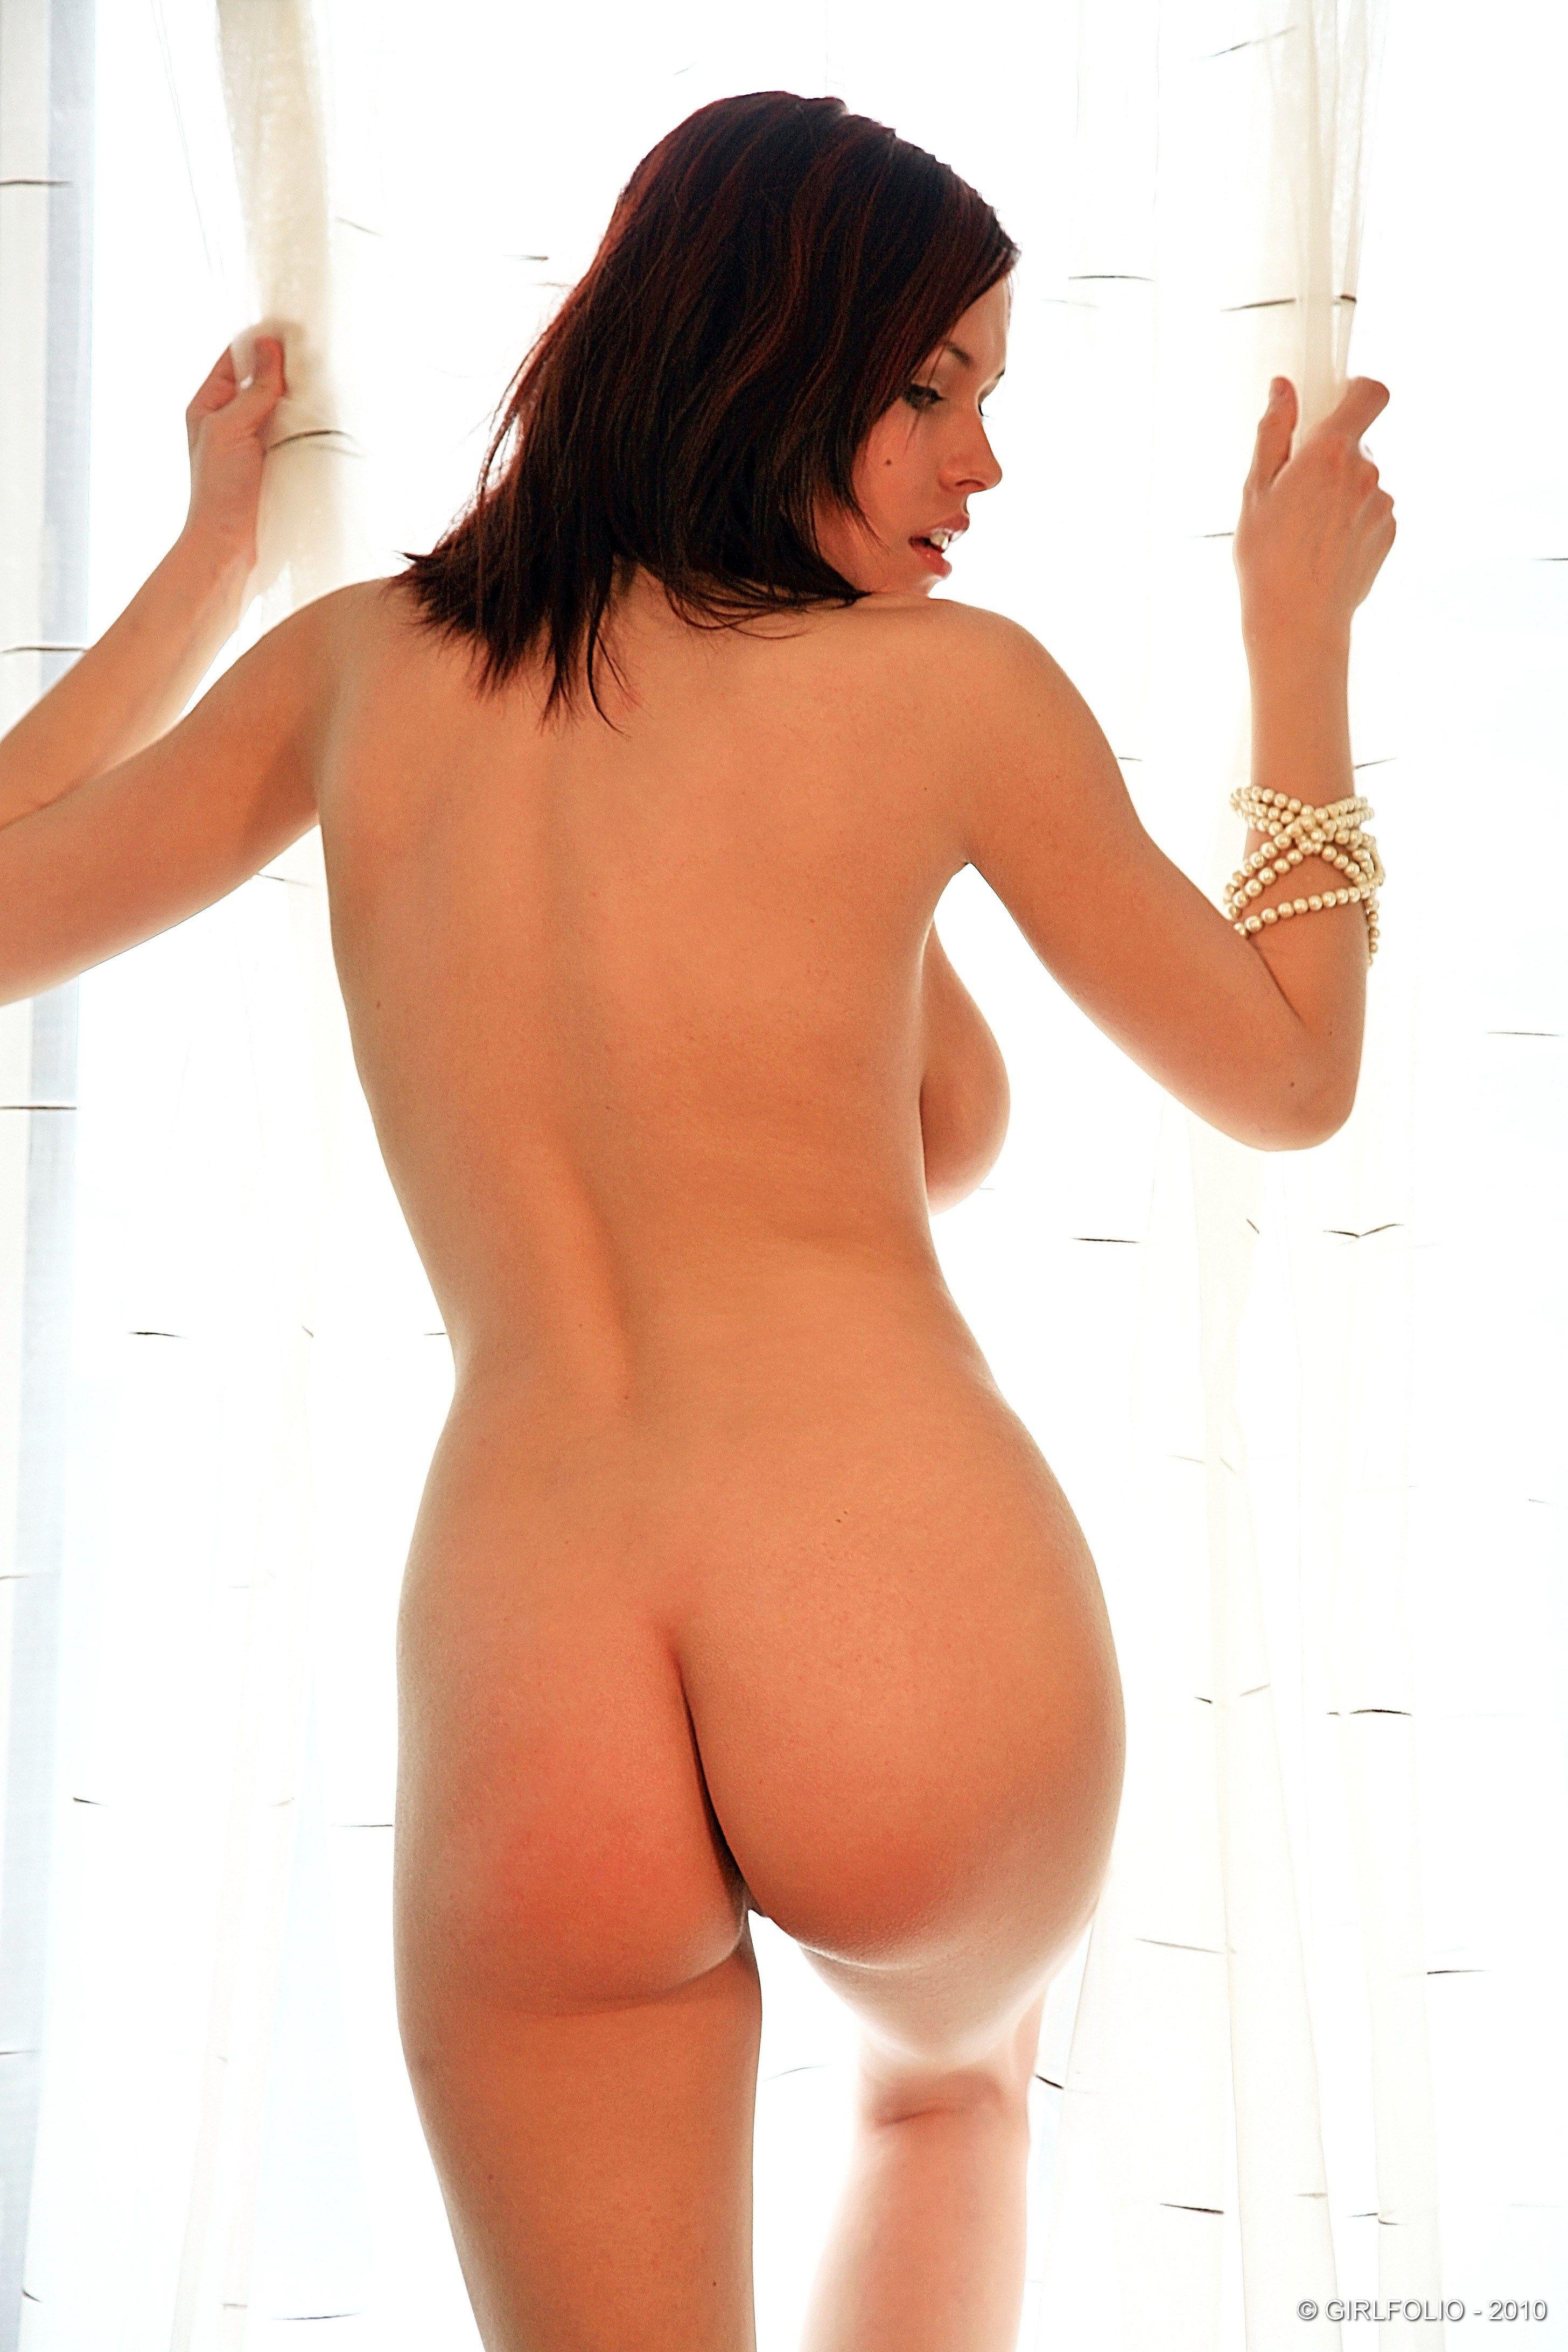 akb48 pussy eve wyrwal pussy nude | Eve Wyrwal | Razorpics.net HQ Celebrity, Asian,